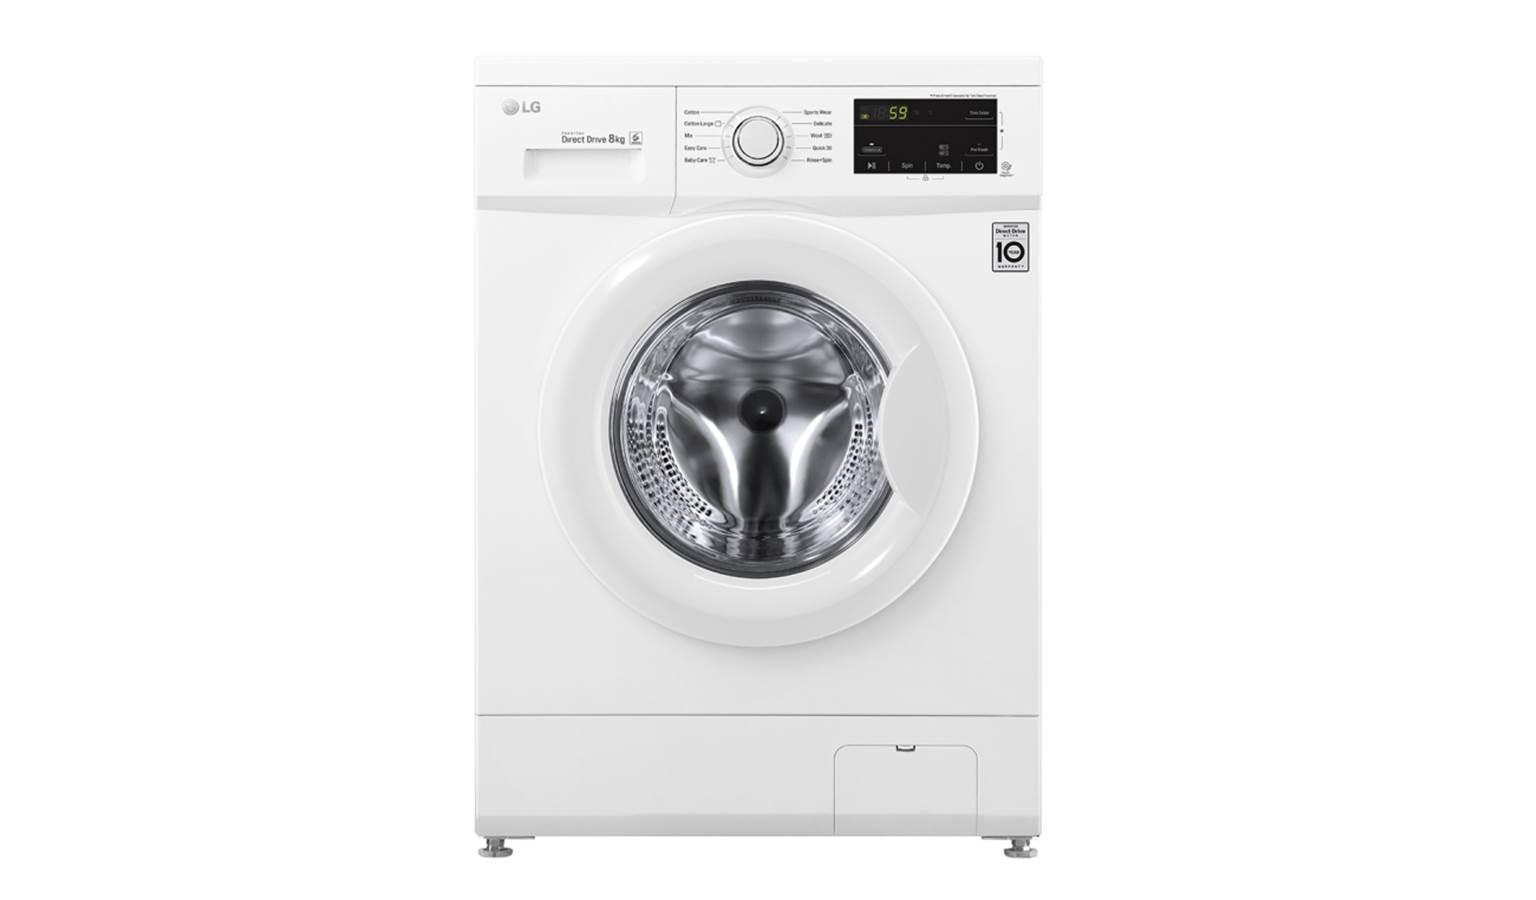 LG WD-MD8000WM 8KG 6 Motion Inverter Direct Drive Washing Machine